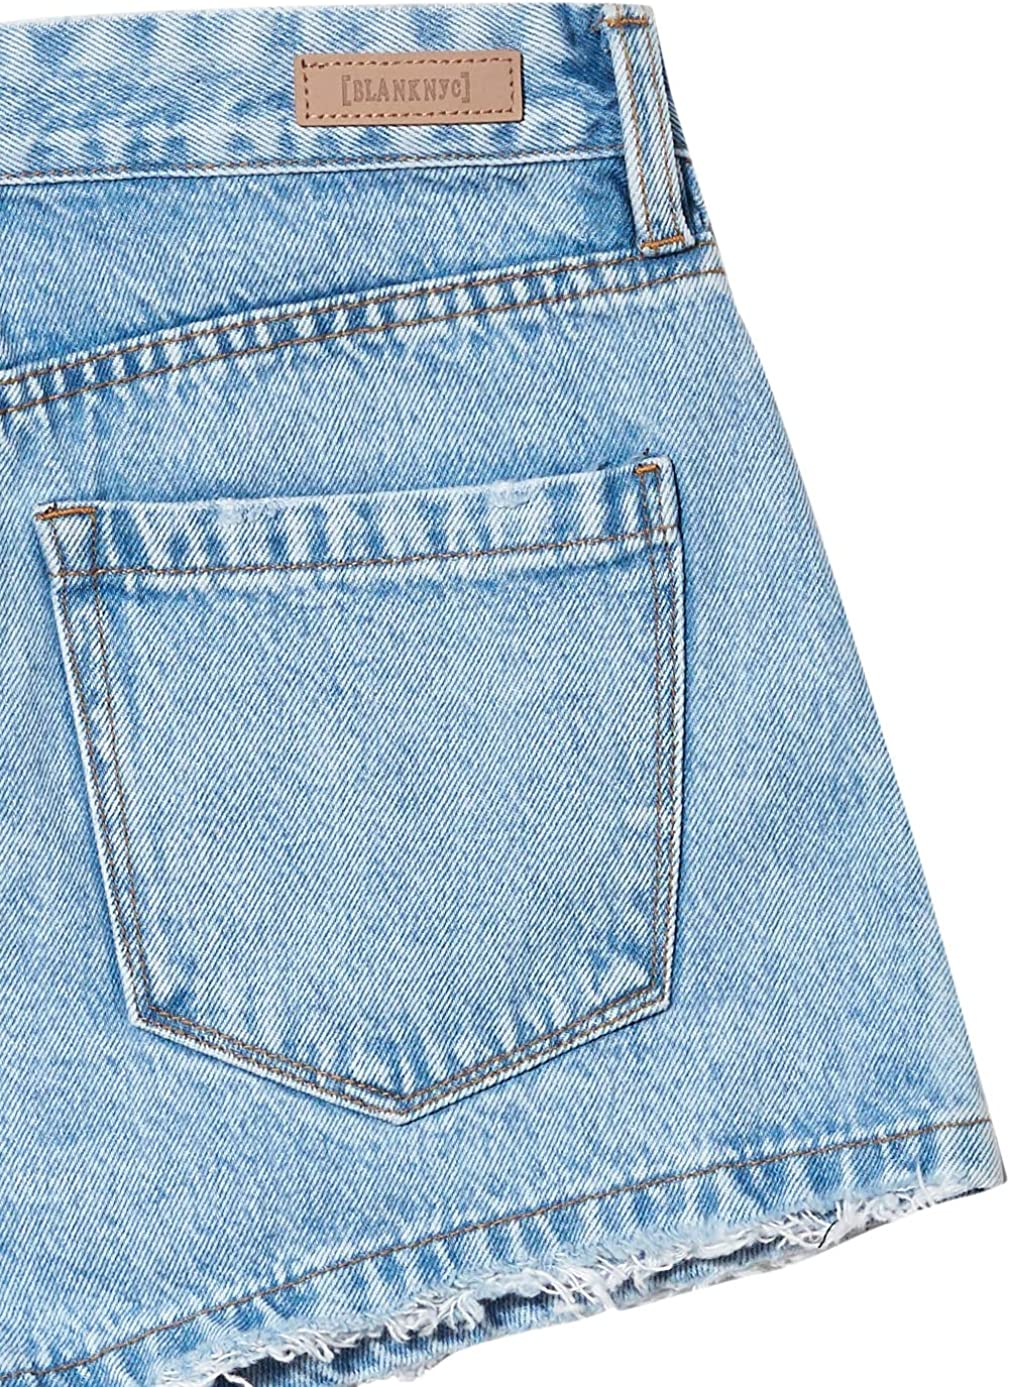 Womens High Rise Five Pocket Denim Short BLANKNYC